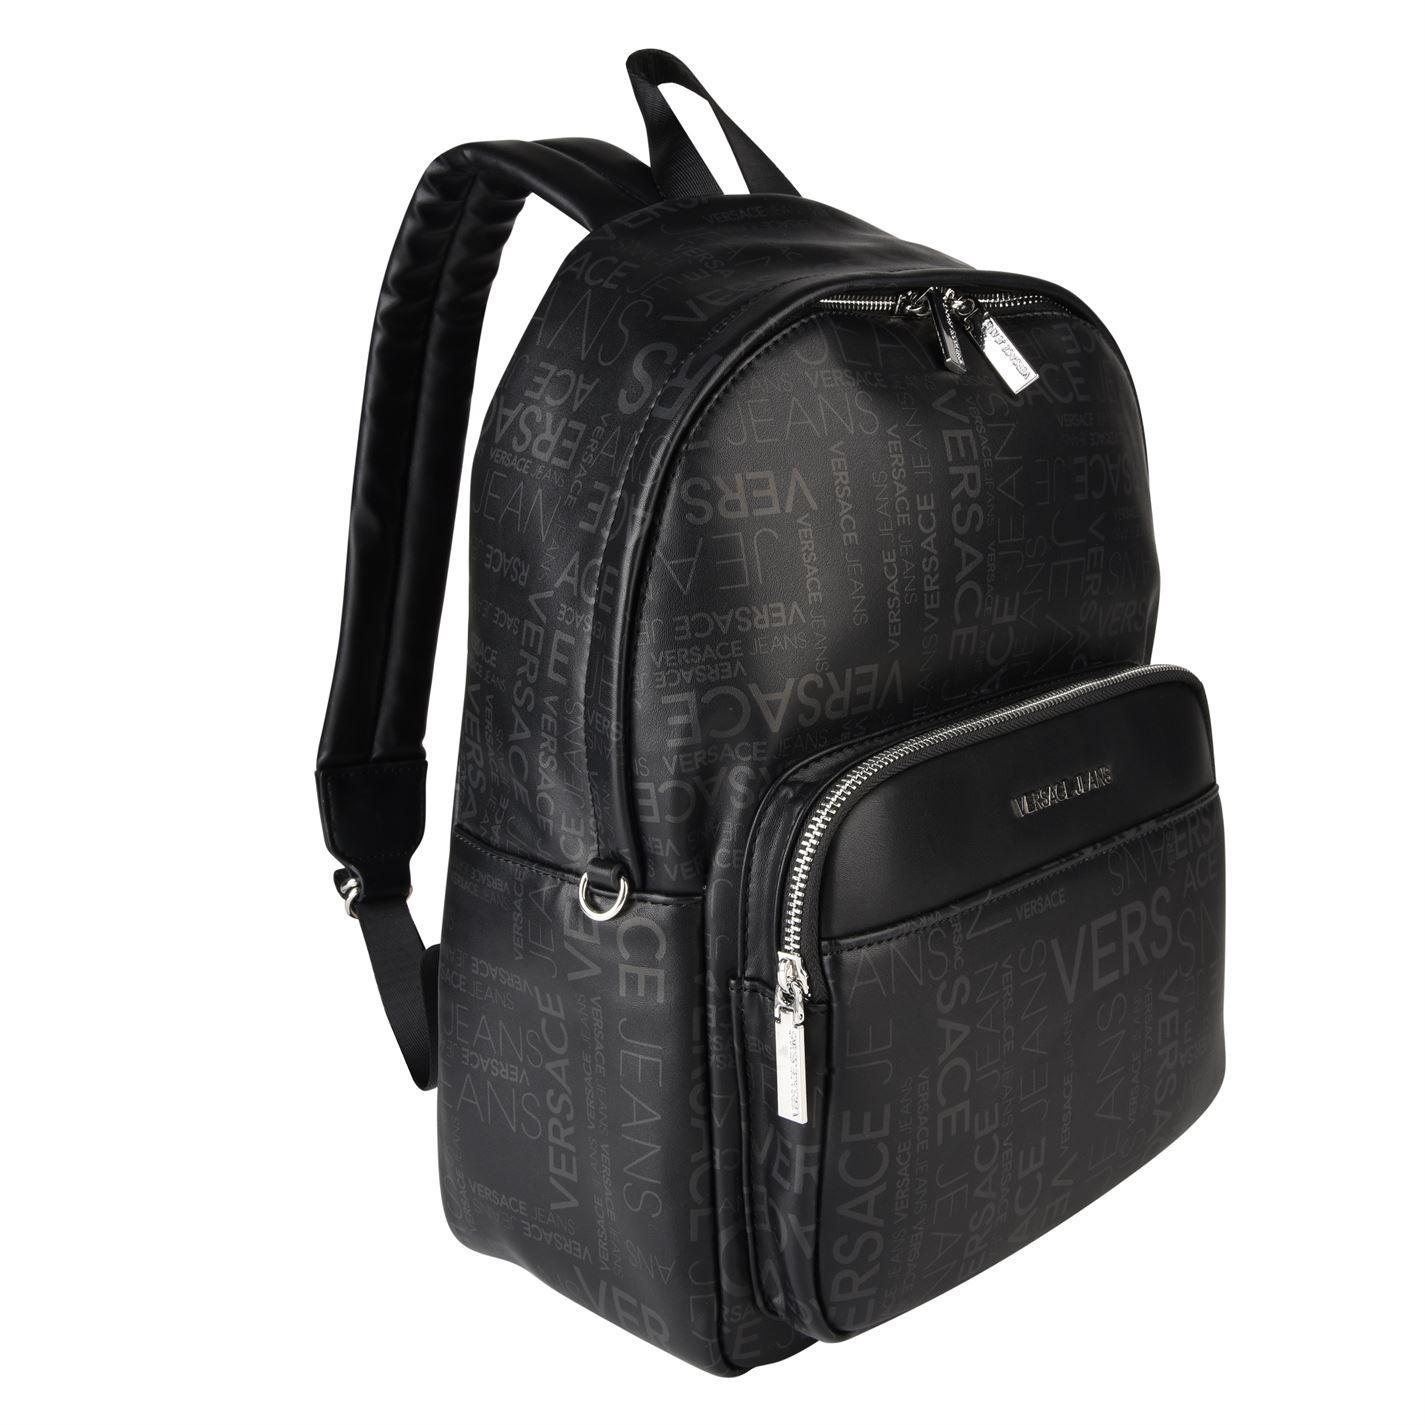 Versace Jeans Couture Denim Logo Print Backpack in Black for Men